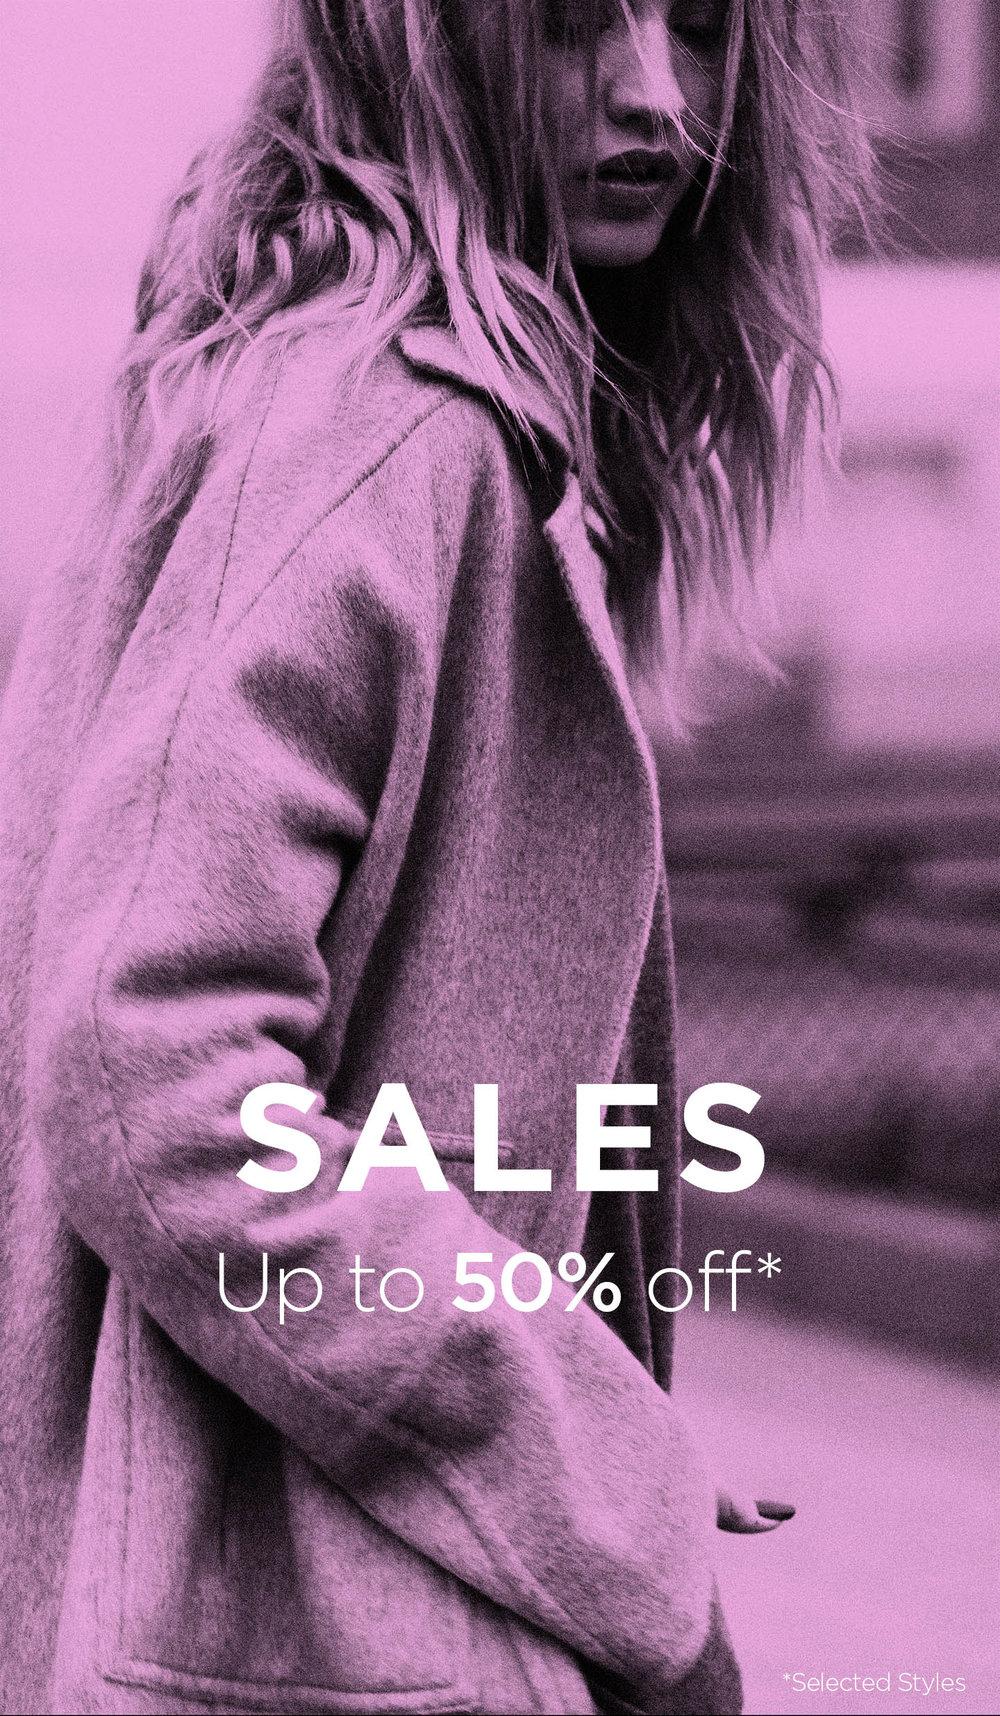 Winter End of Sales Poster.jpg